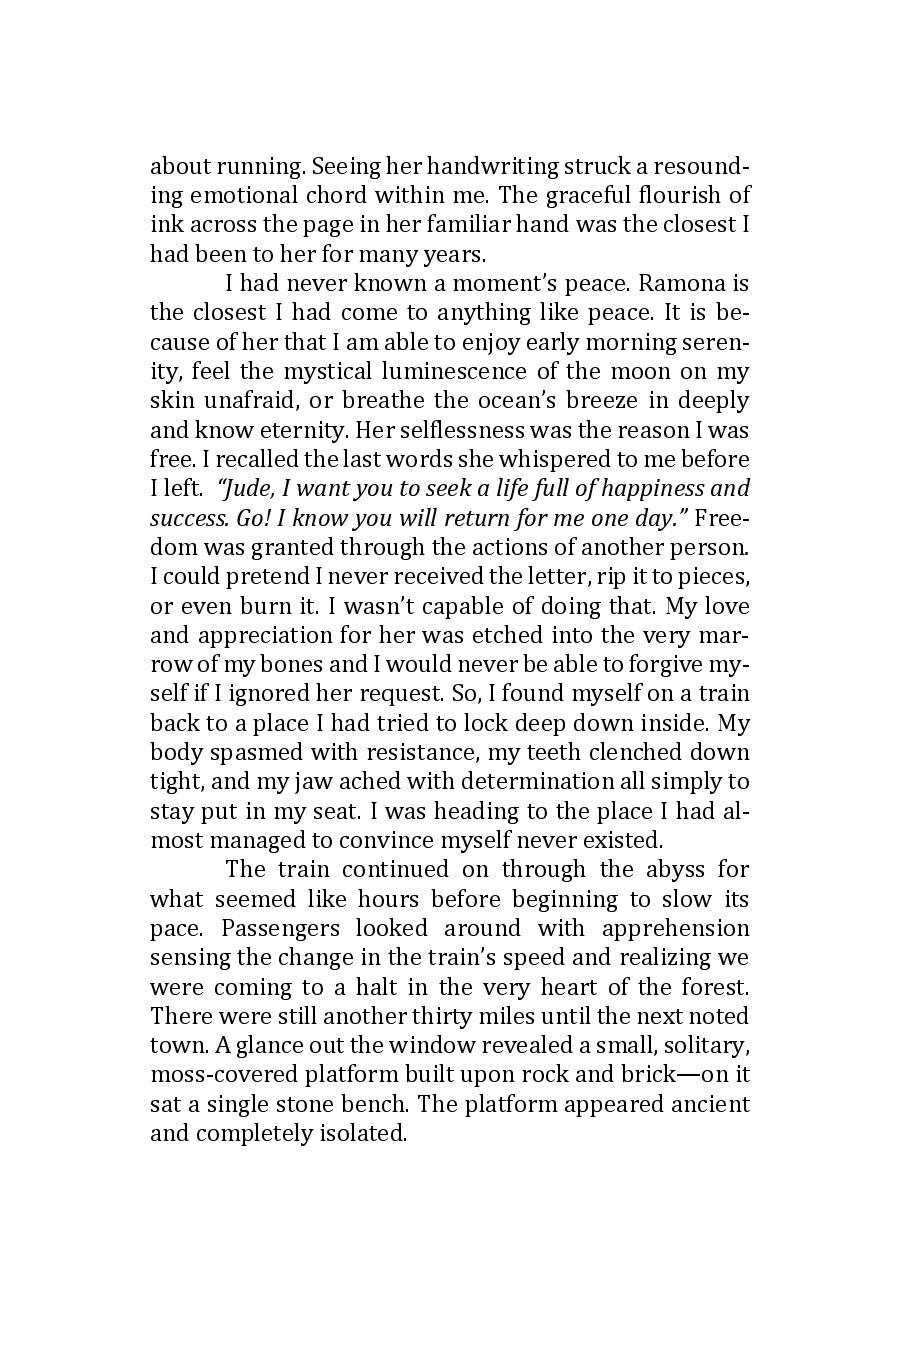 Hinnom Magazine 002 Manuscript E-Book 2-page-126